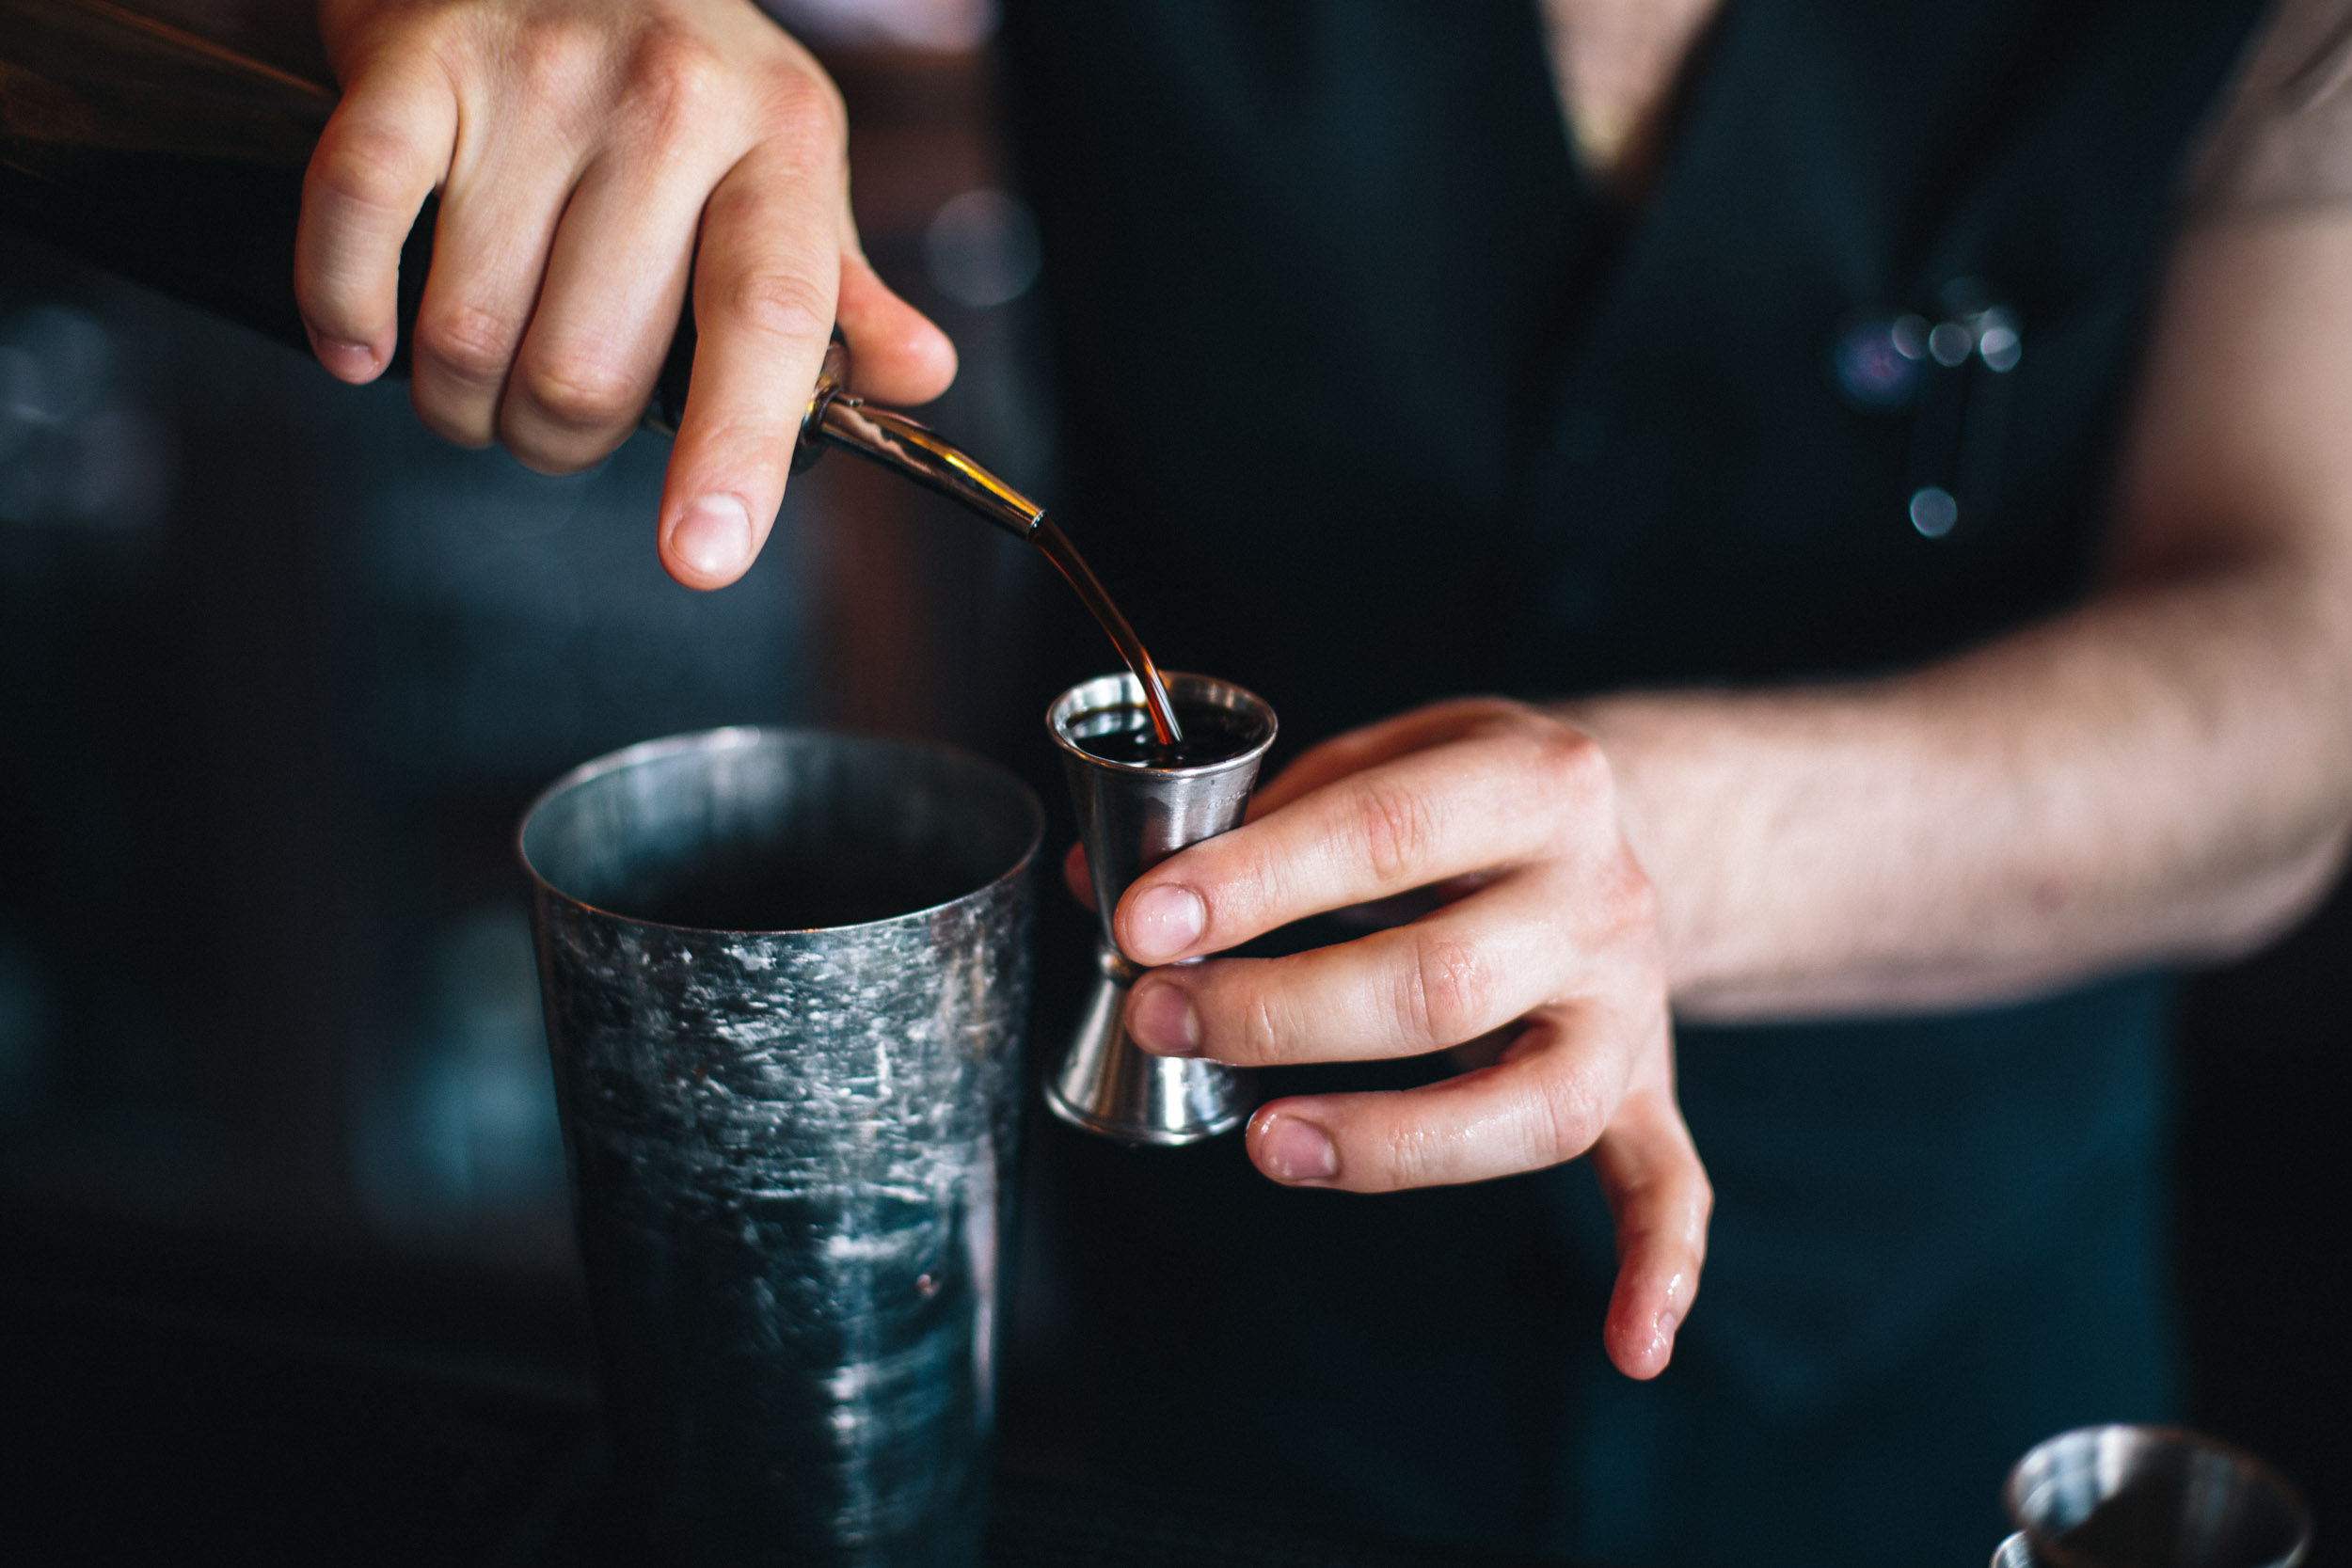 jimmy-rowalt-atlanta-coffee-food-drink-photography-083.jpg